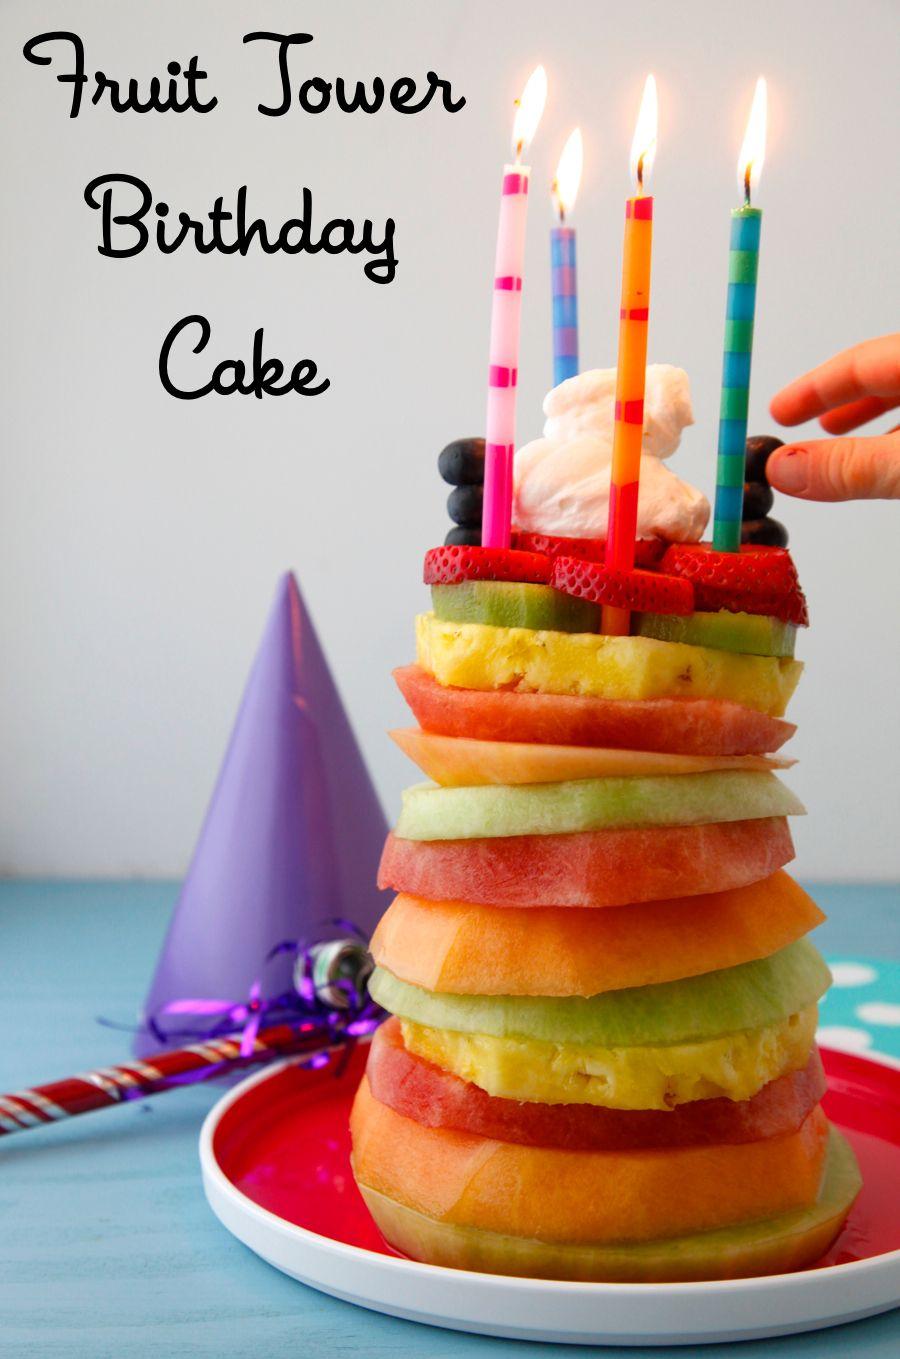 Fruit Tower Birthday Cake Weelicious Recipes Pinterest Healthy